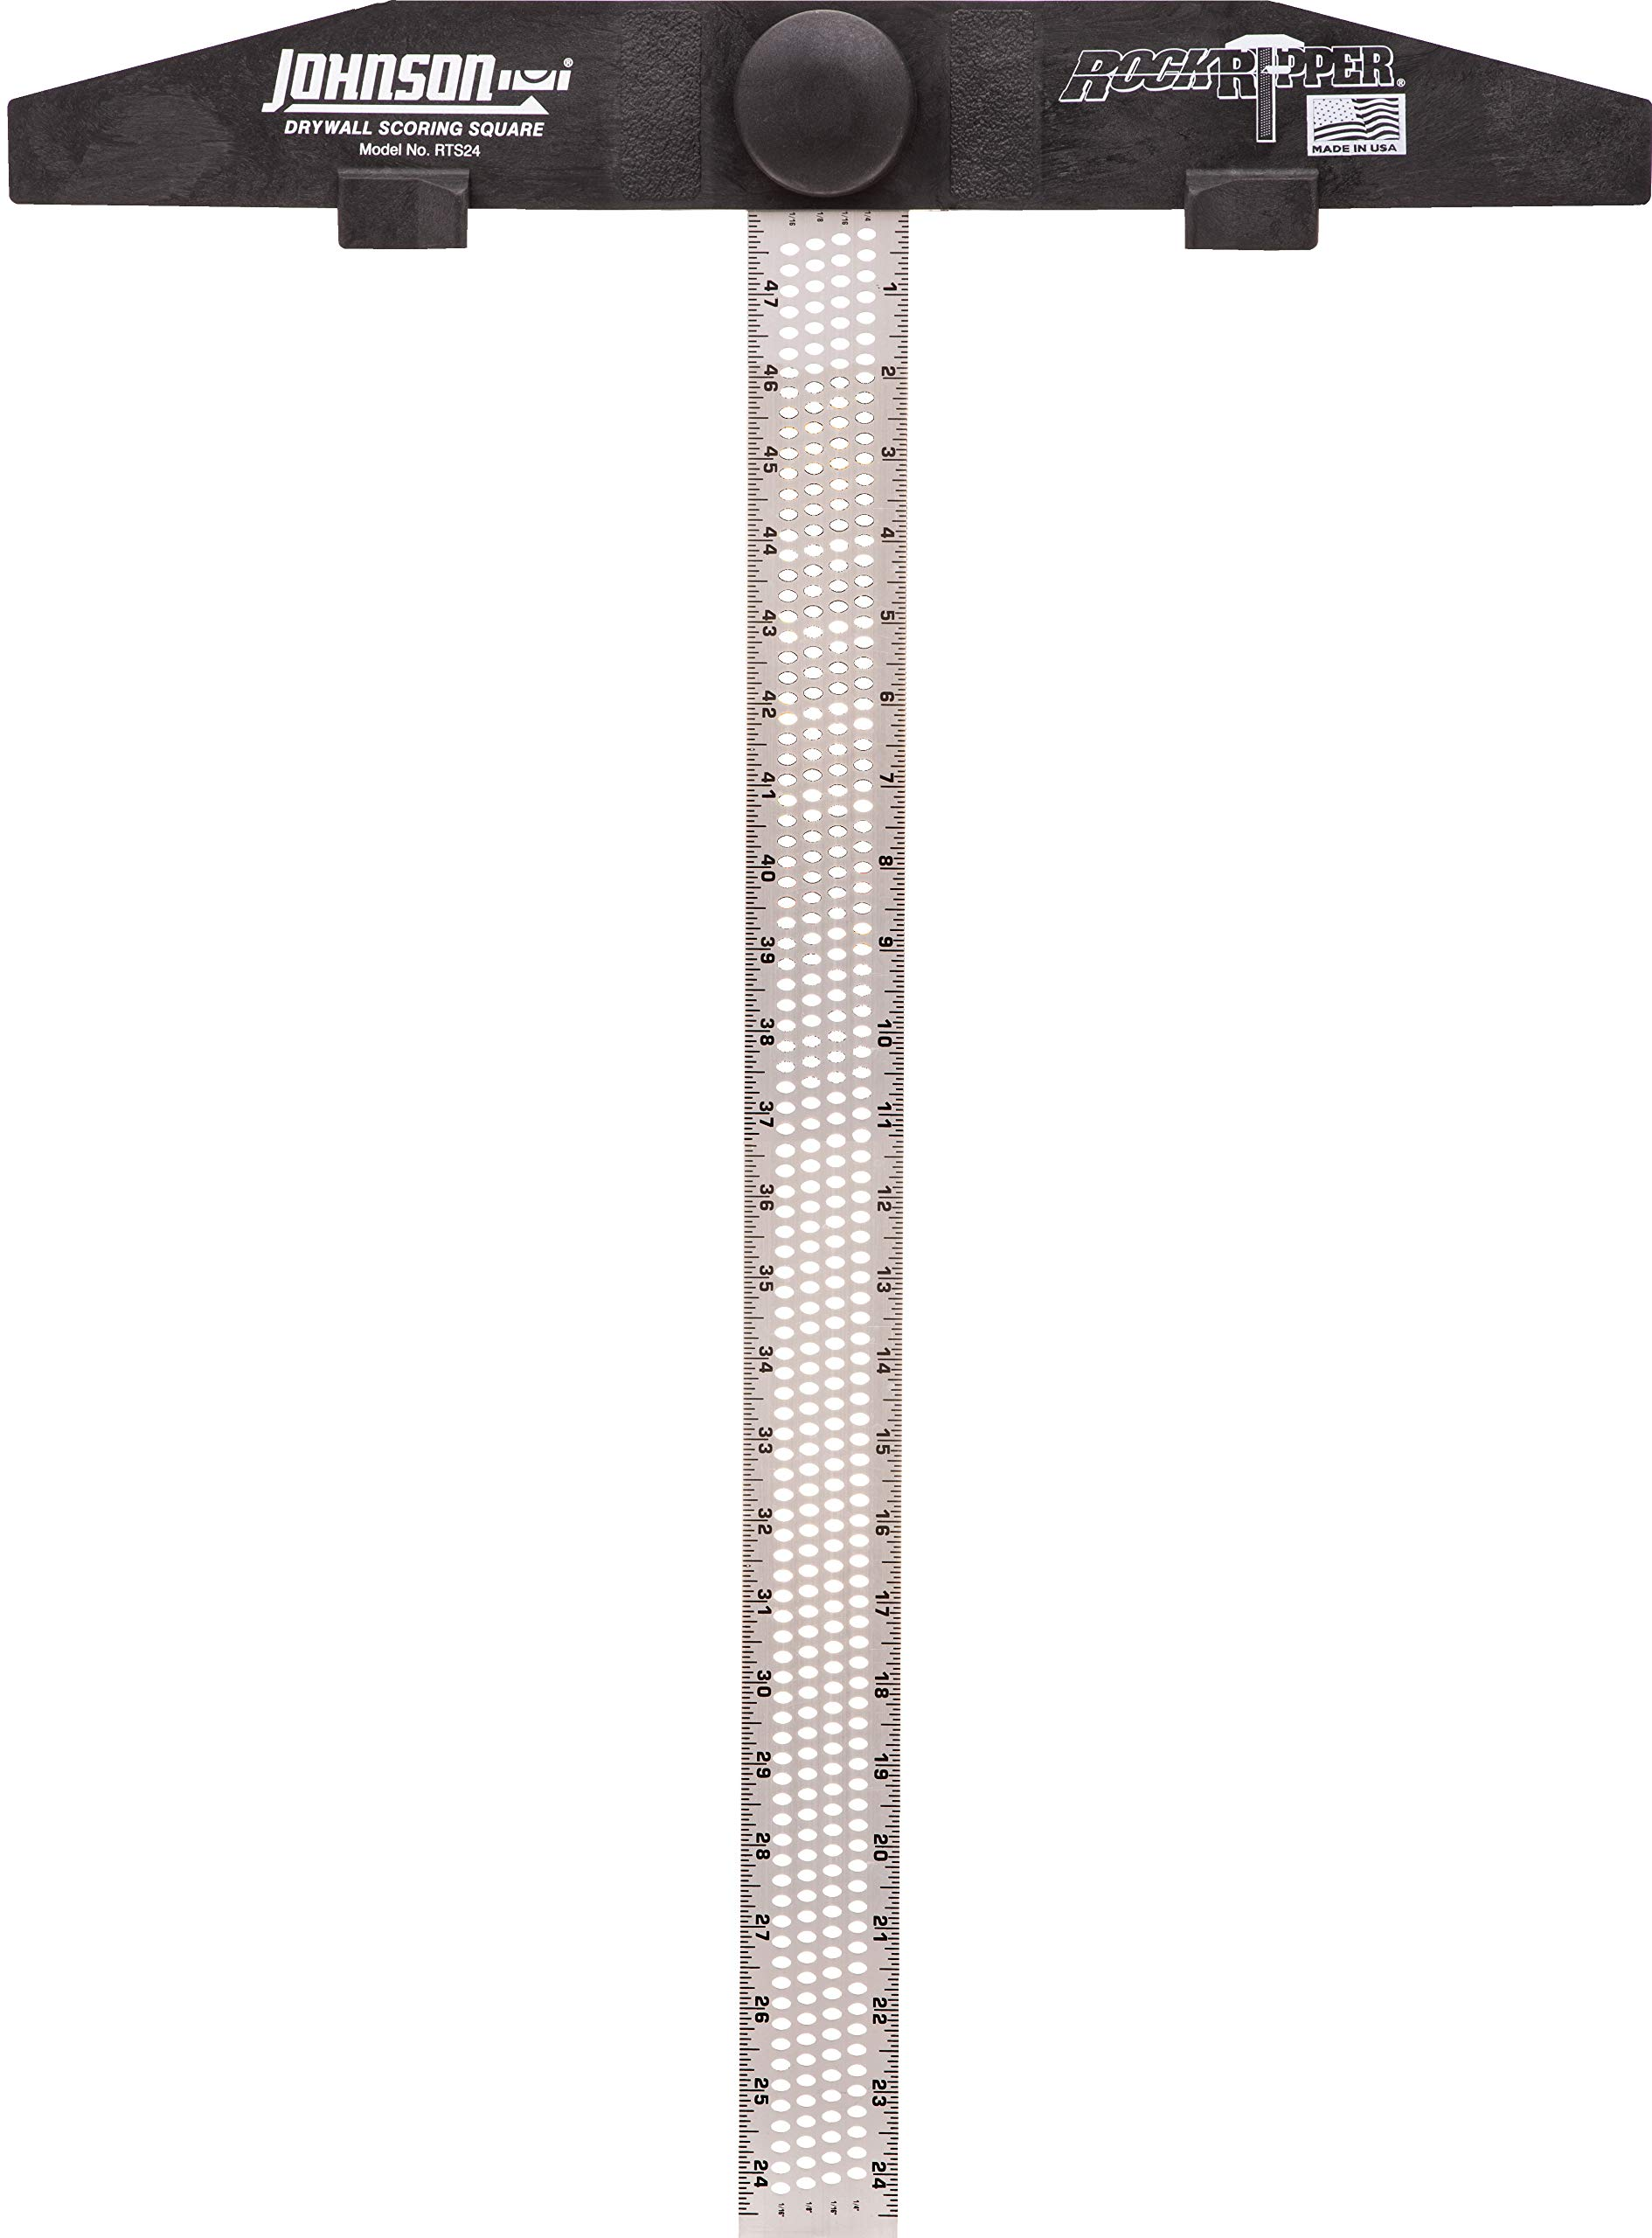 Johnson Level & Tool RTS24 24-Inch RockRipper - Drywall Scoring Square